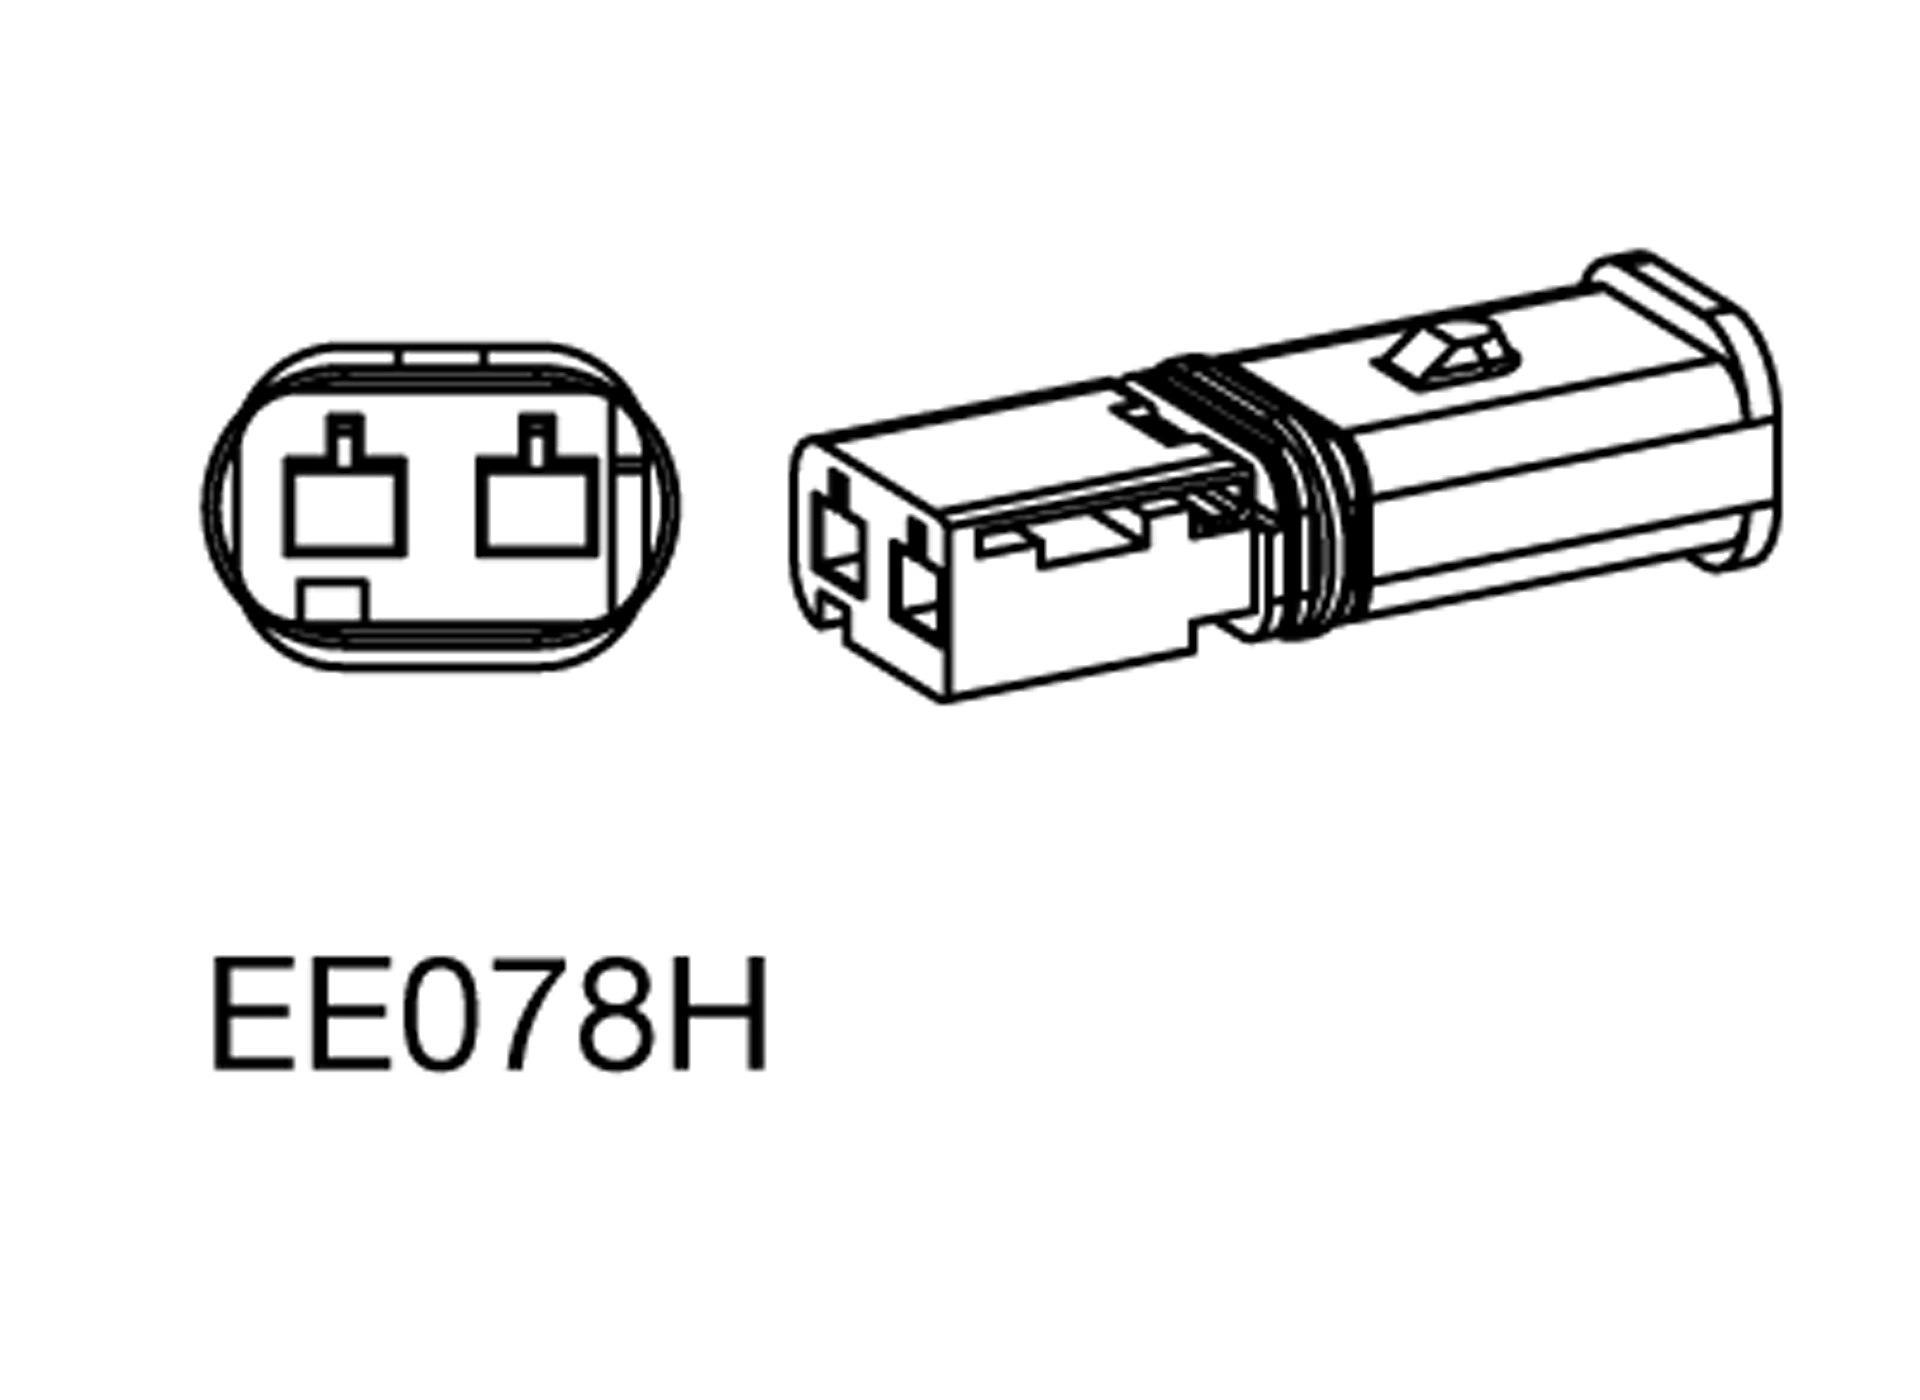 【RIZOMA】方向燈線束套件 - 「Webike-摩托百貨」